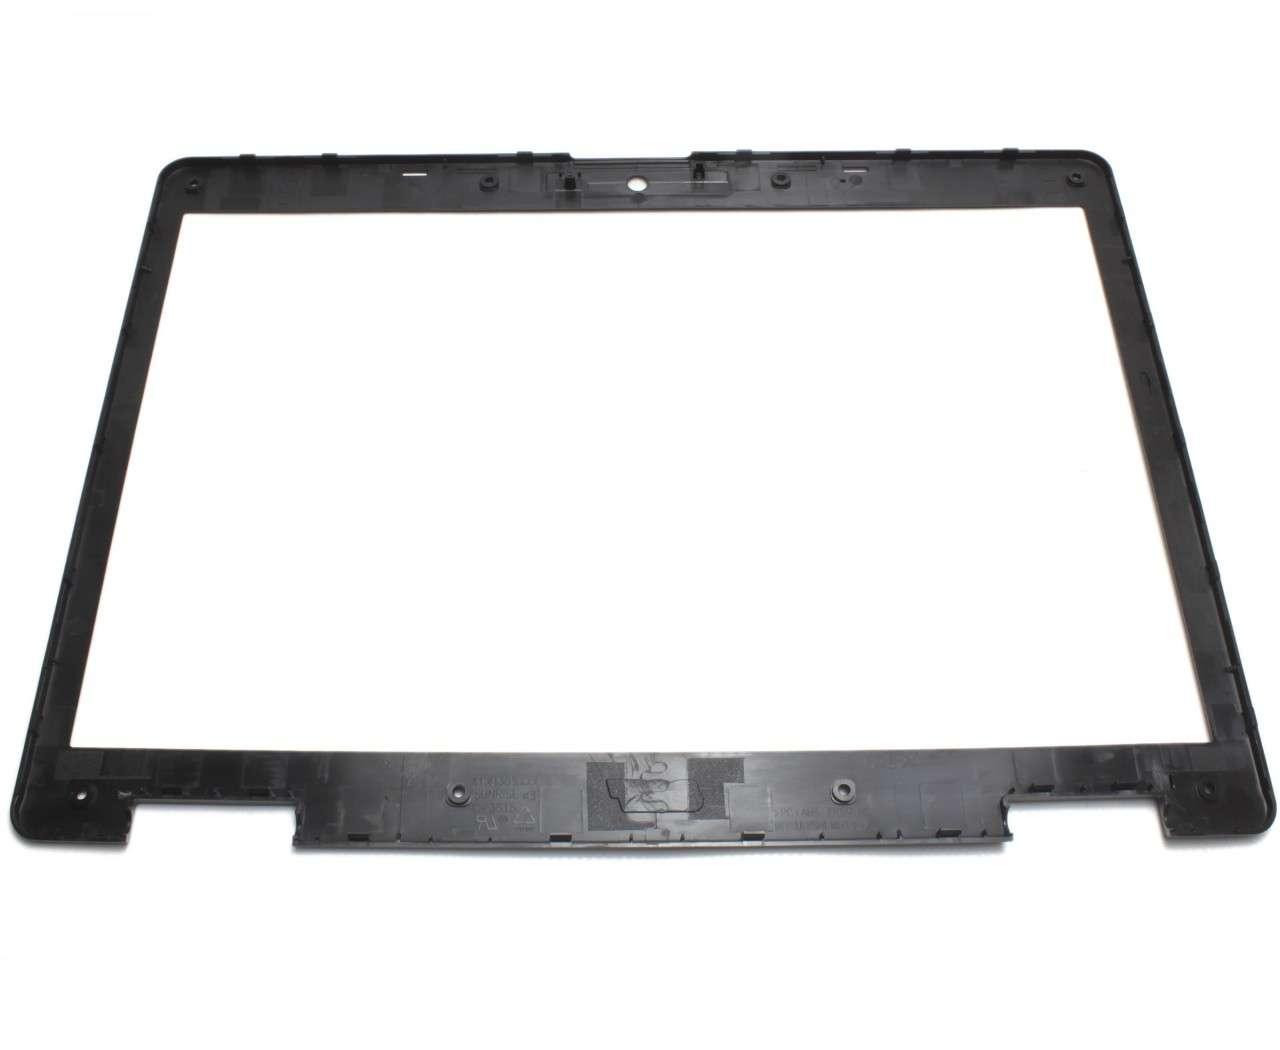 Rama Display Acer Extensa 5610g Bezel Front Cover Neagra imagine